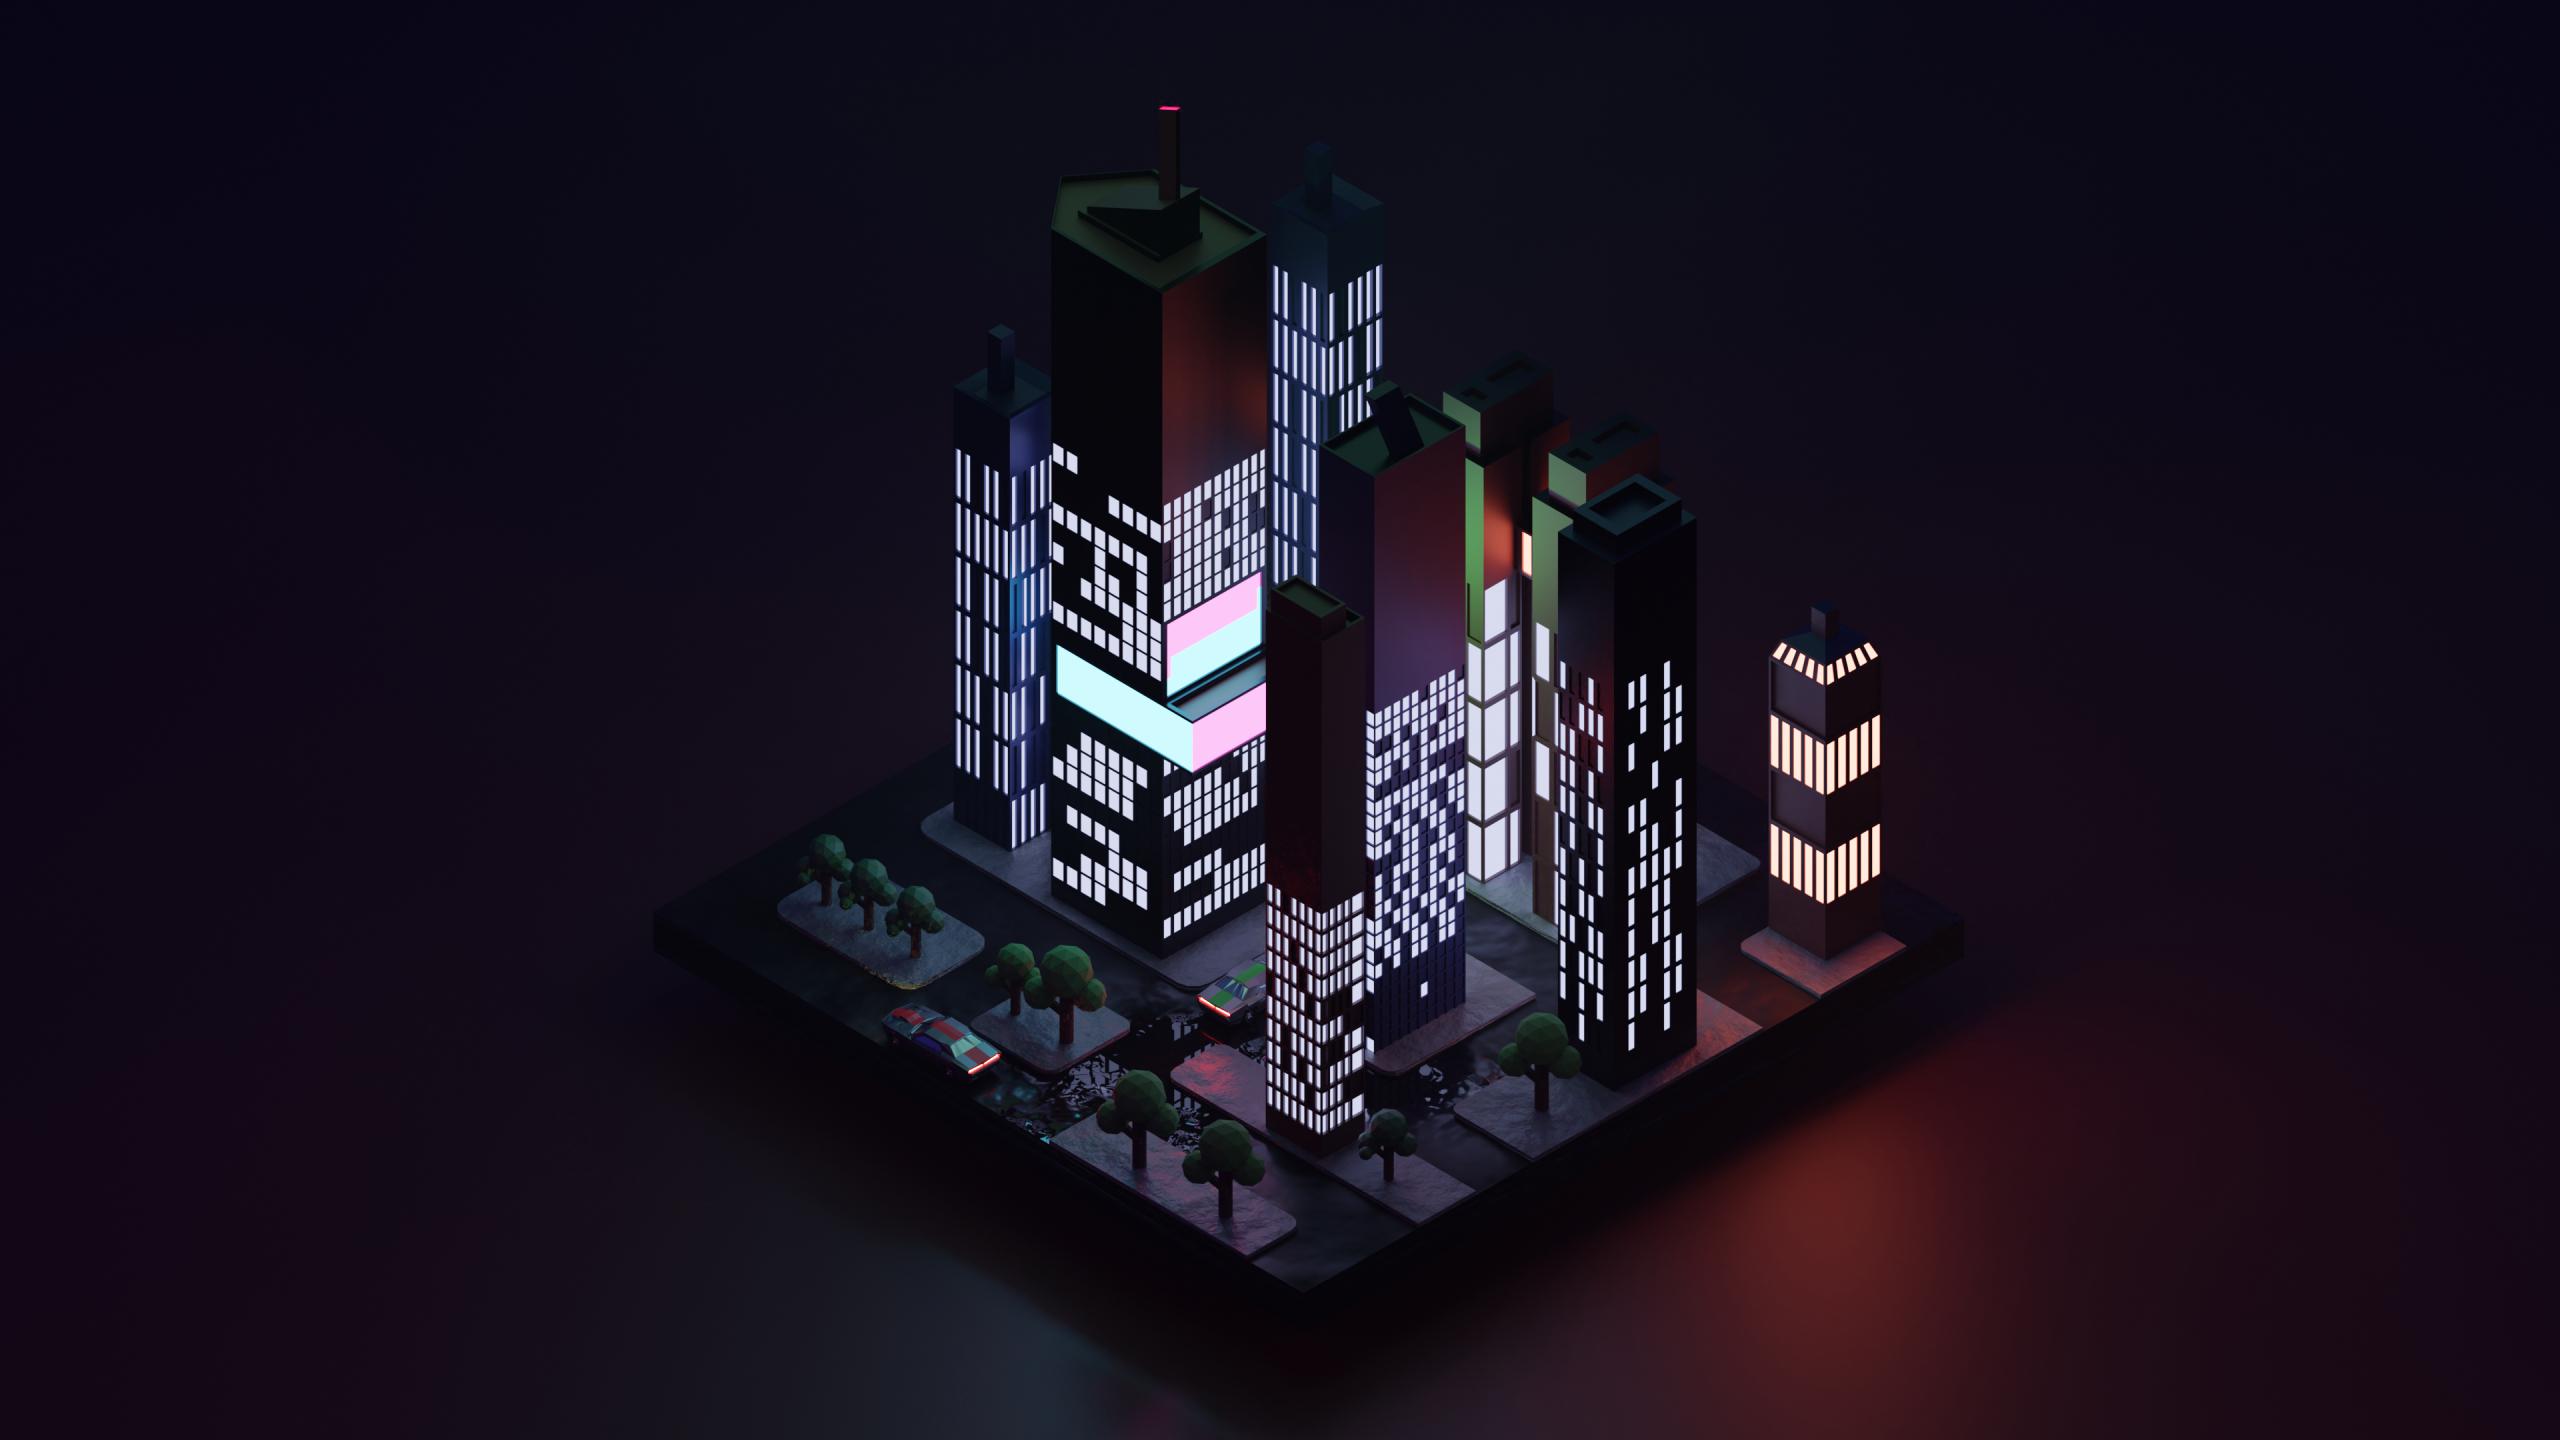 2560x1440 Low Poly City Block 1440p Resolution Wallpaper Hd